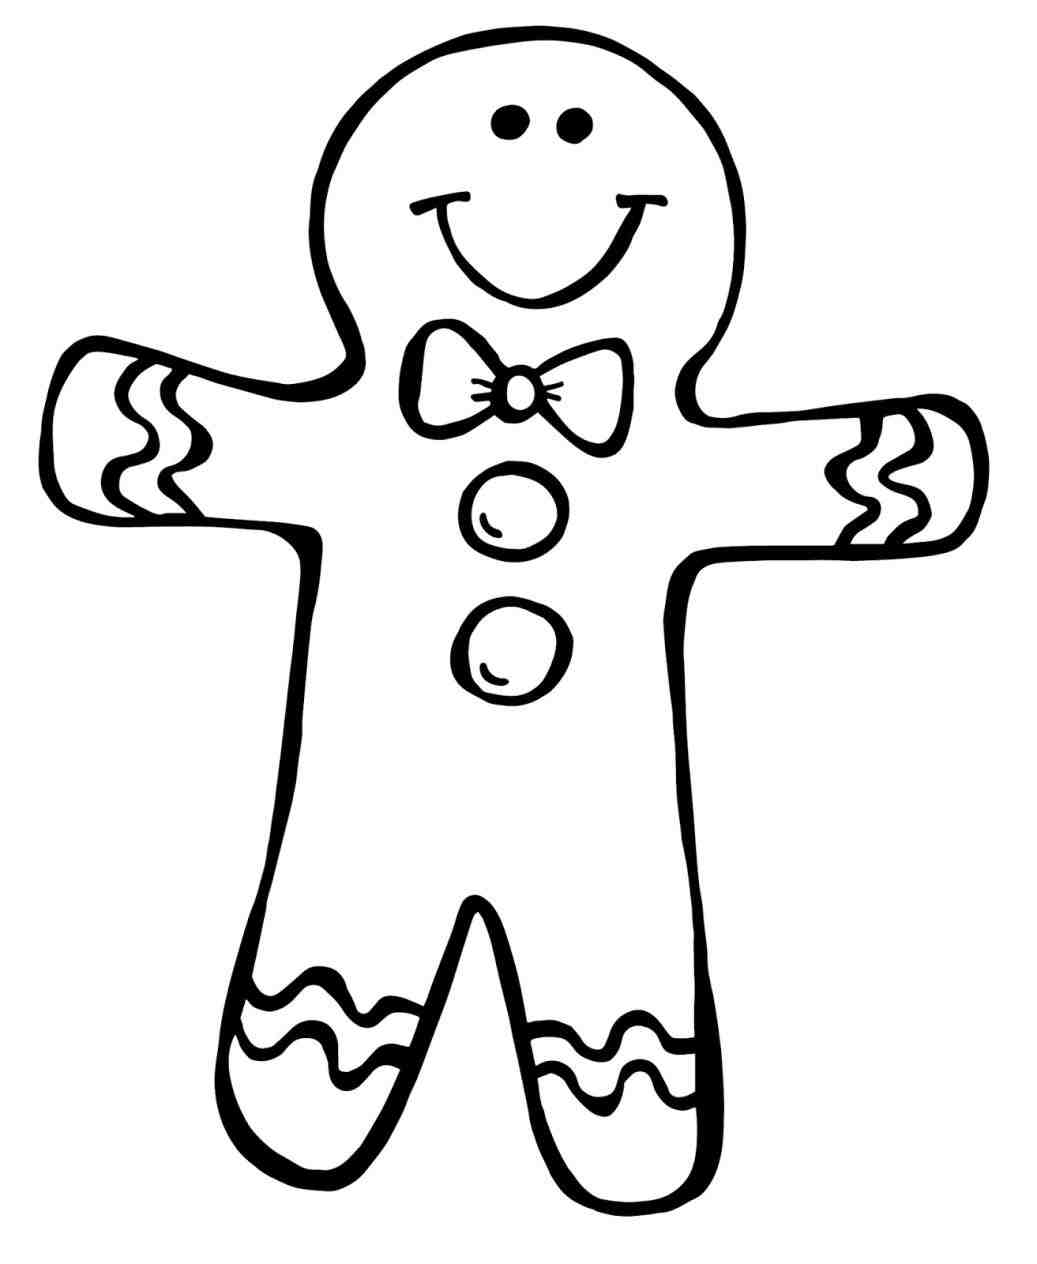 1037x1264 Christmas Gingerbread Man Clipart Cheminee.website